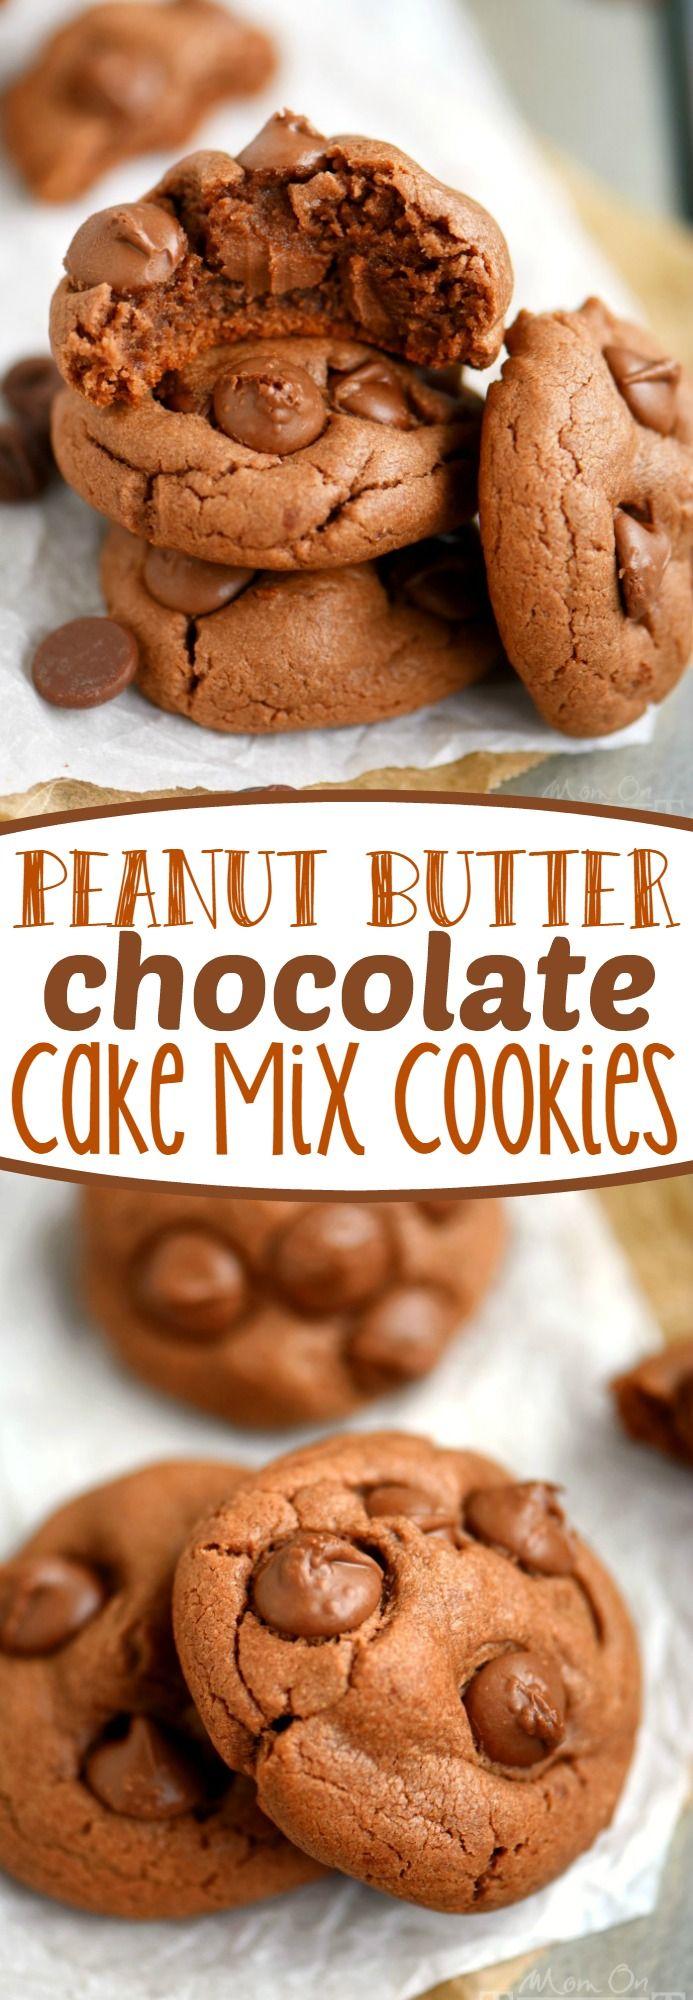 How Do I Turn German Chocolate Cake Mix Into Cookies